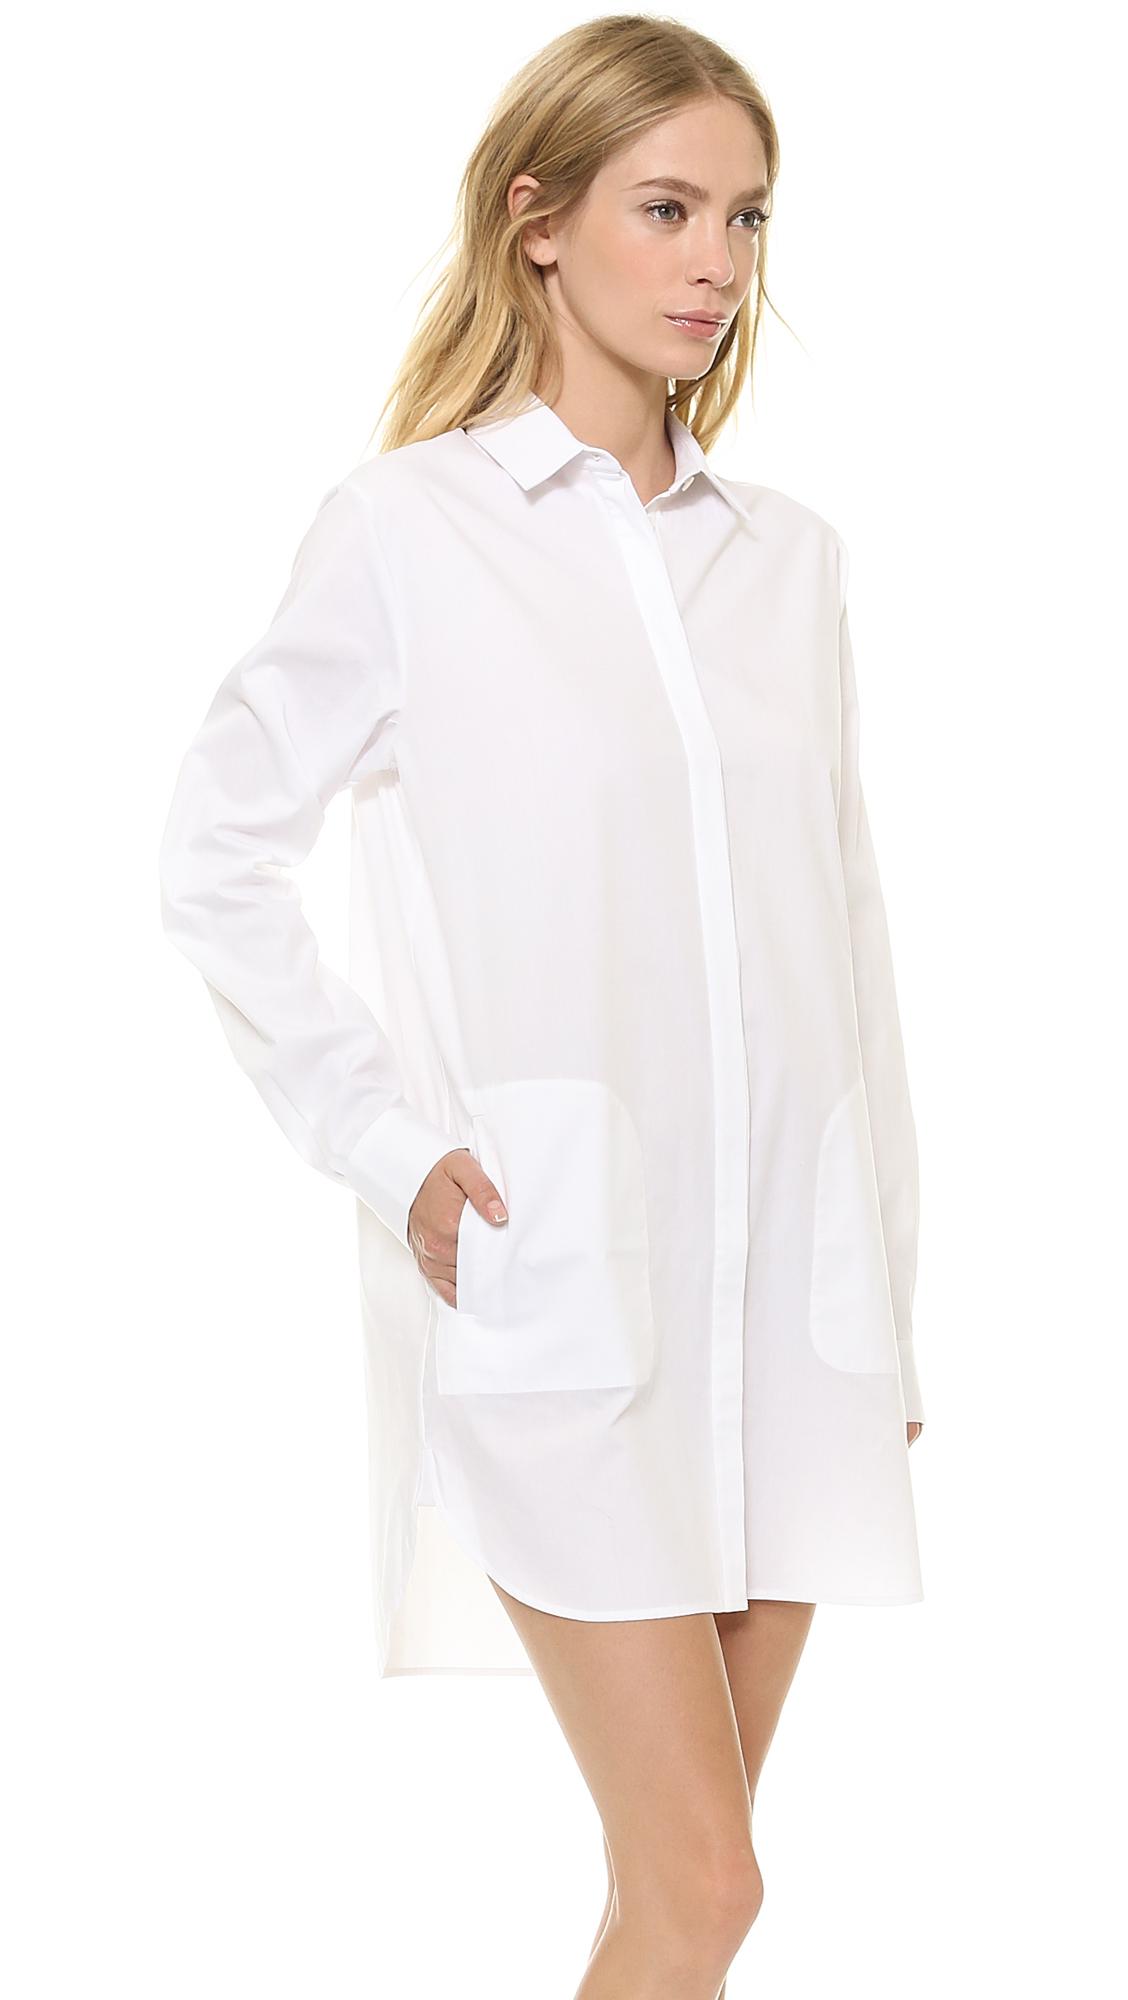 Long White Shirt Photo Album - The Fashions Of Paradise